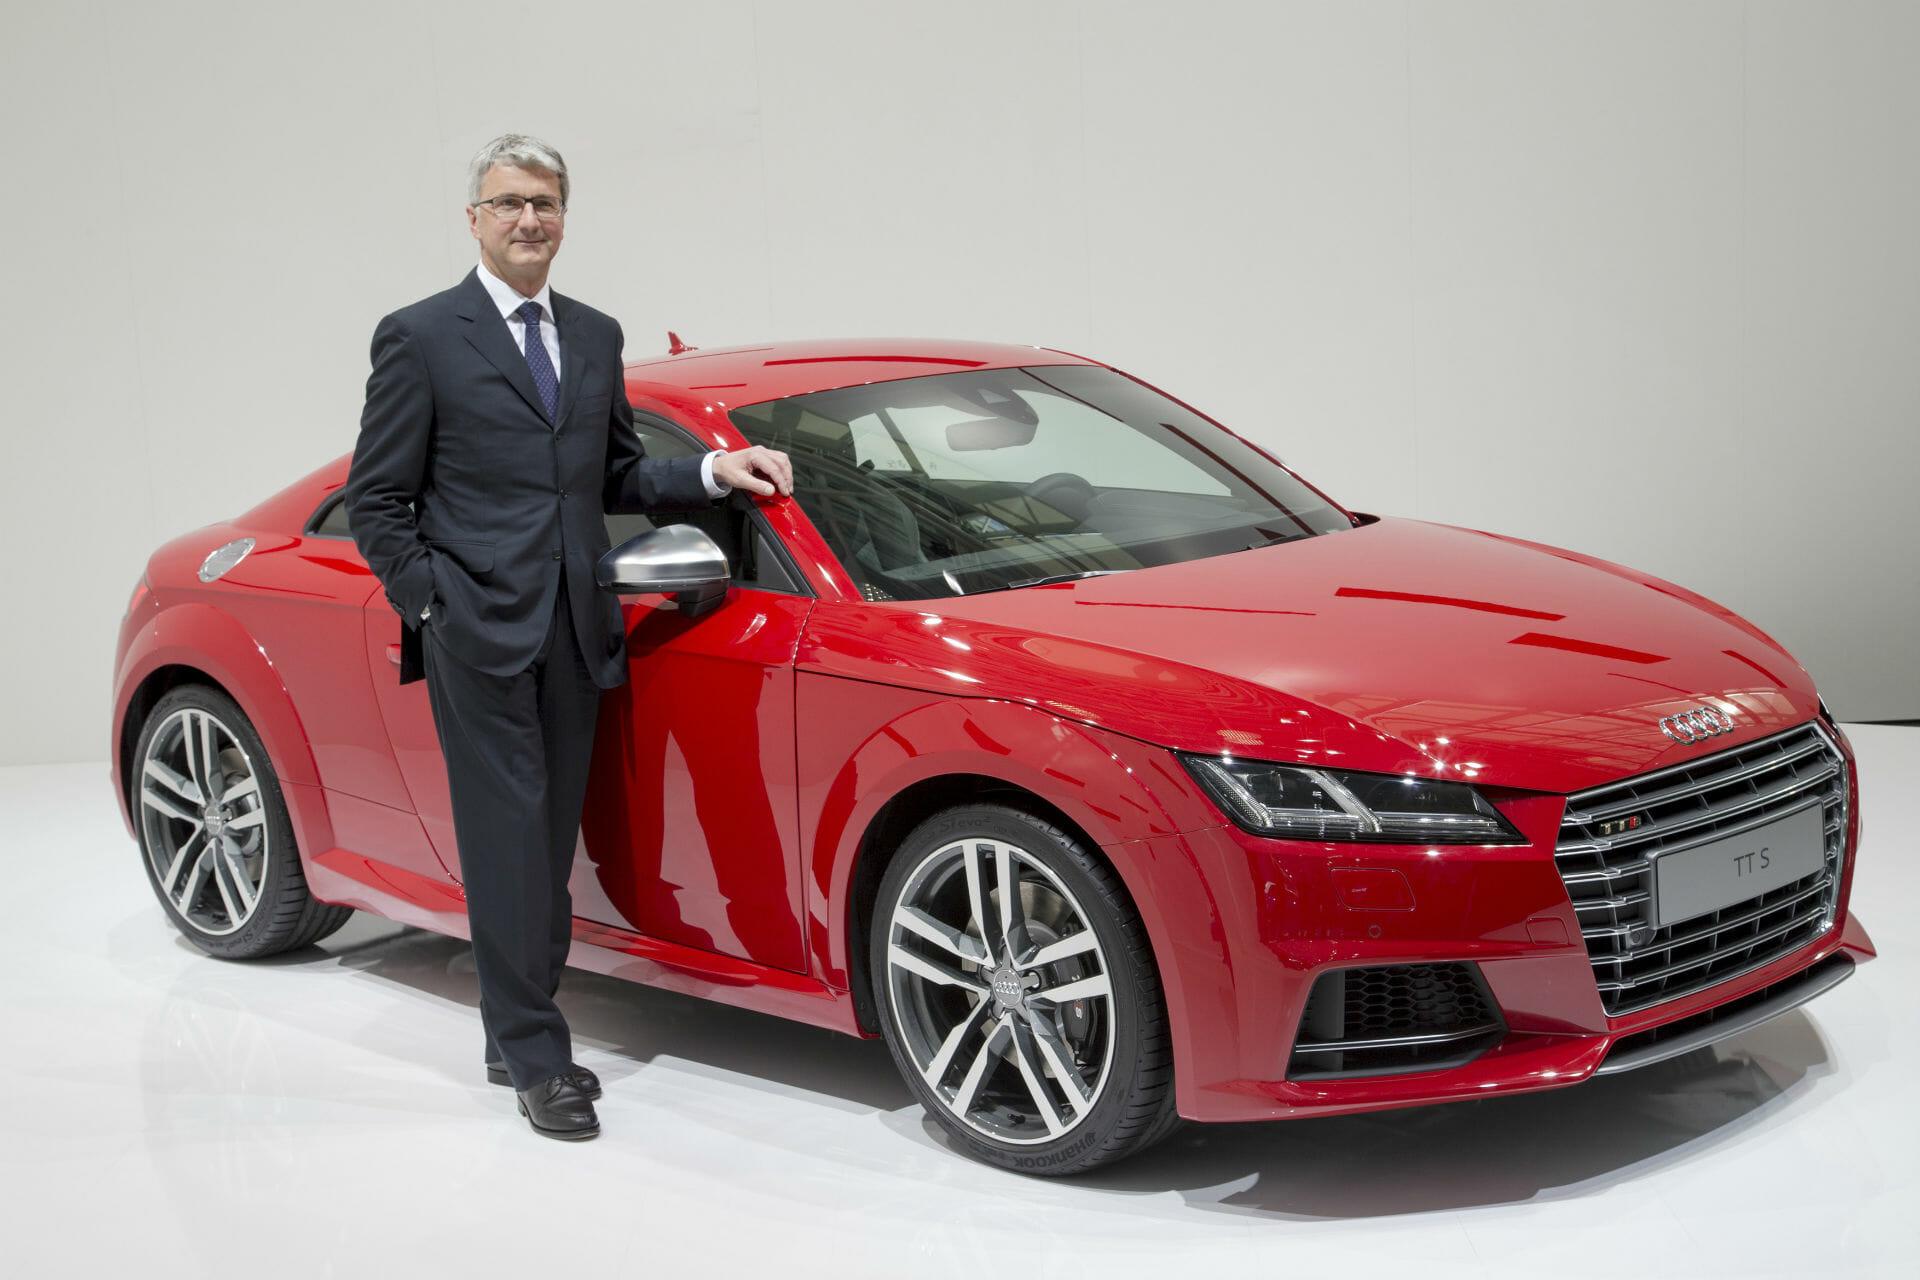 Rupert Stadler - Vorsitzender des Vorstands der AUDI AG neben dem neuen Audi TTS